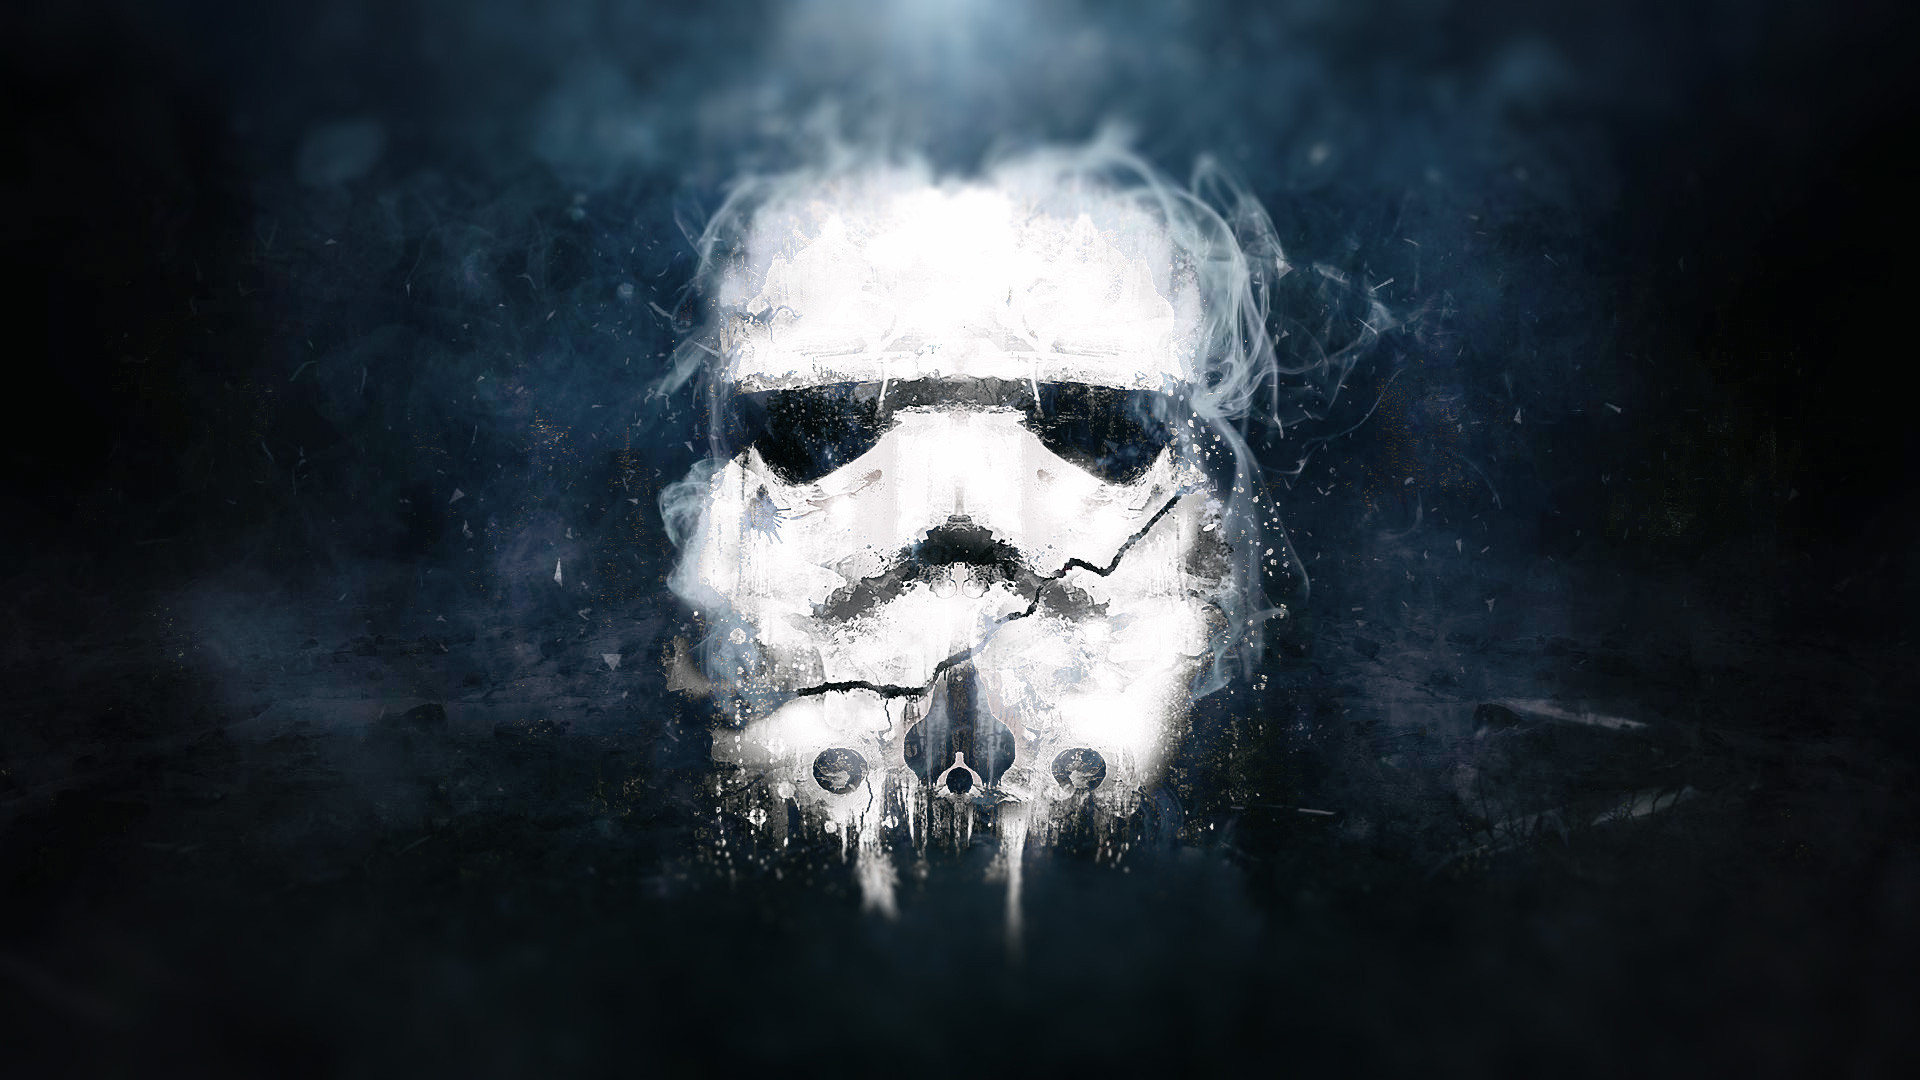 Spooky Stormtrooper Wallpaper